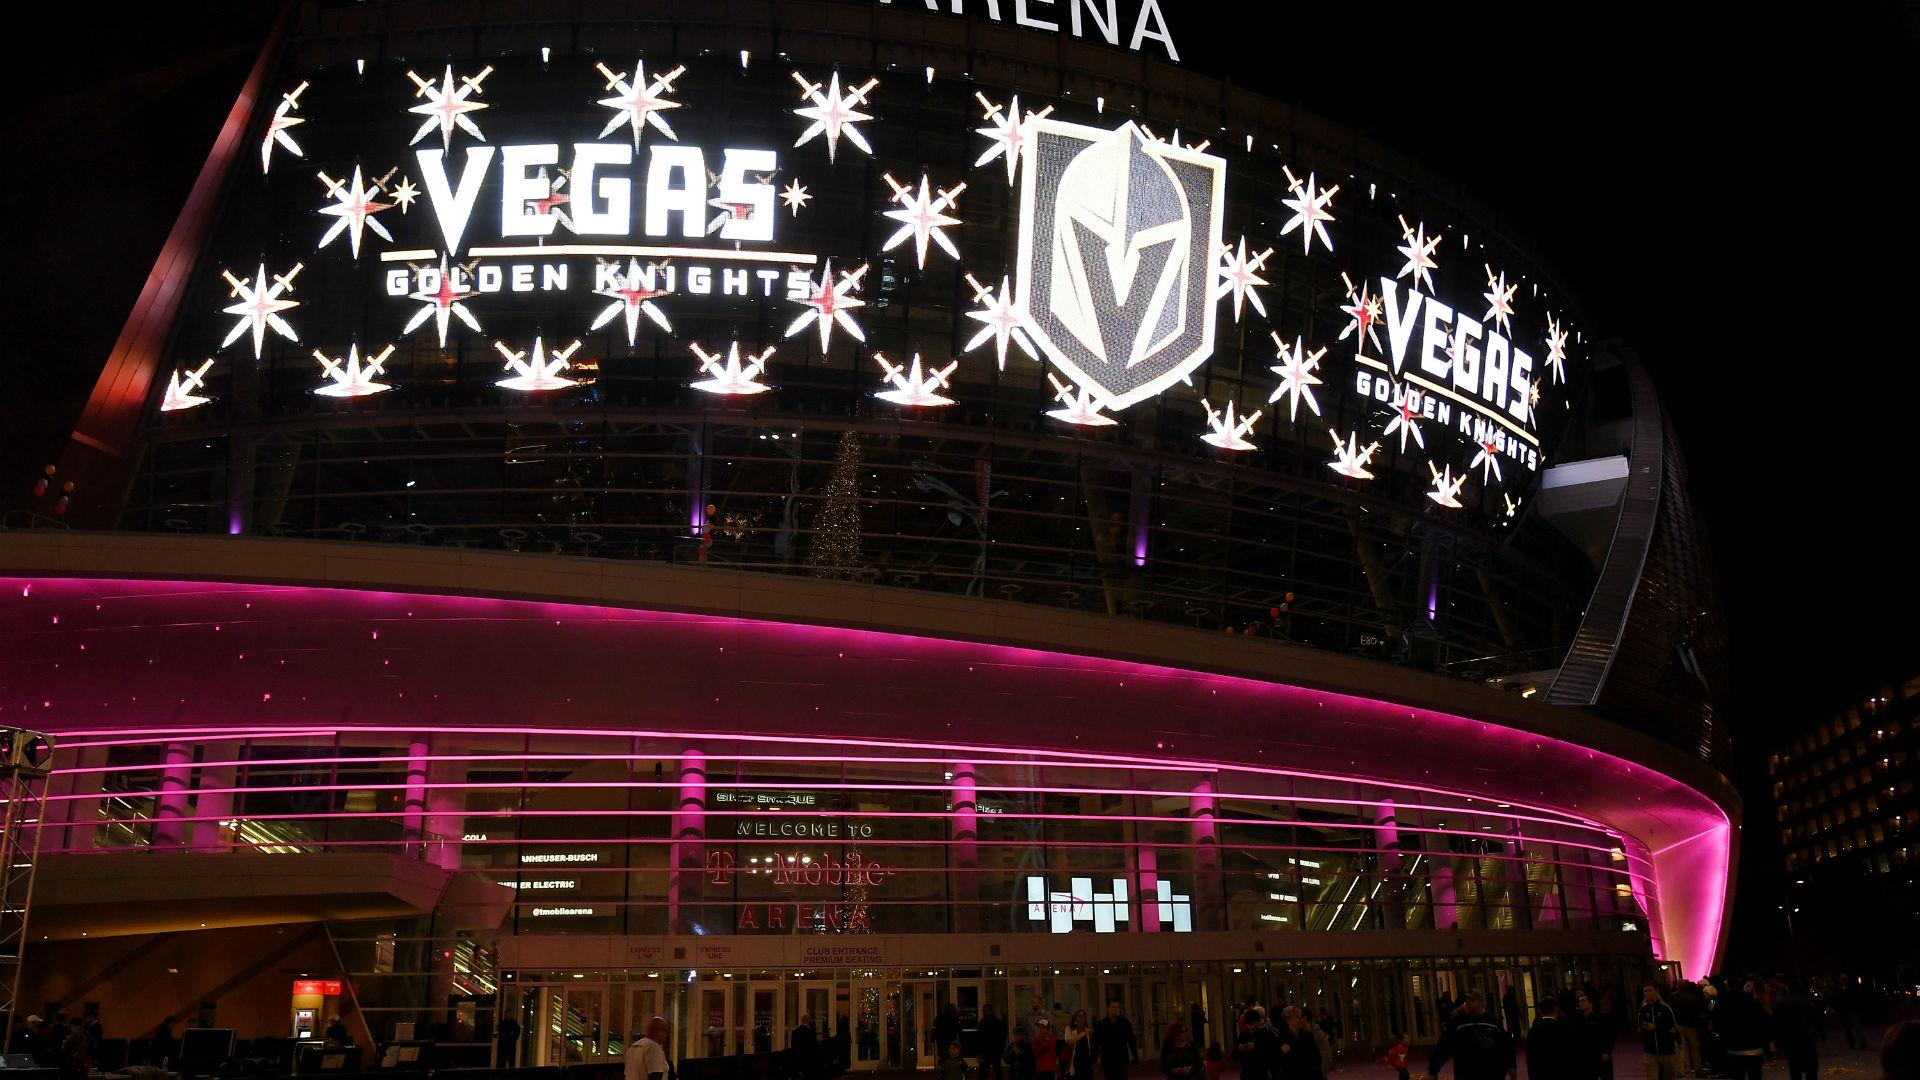 Vegas-golden-knights-07192018-usnews-getty-ftr_st1g6qqk8bok1pe48bn6bwbc1